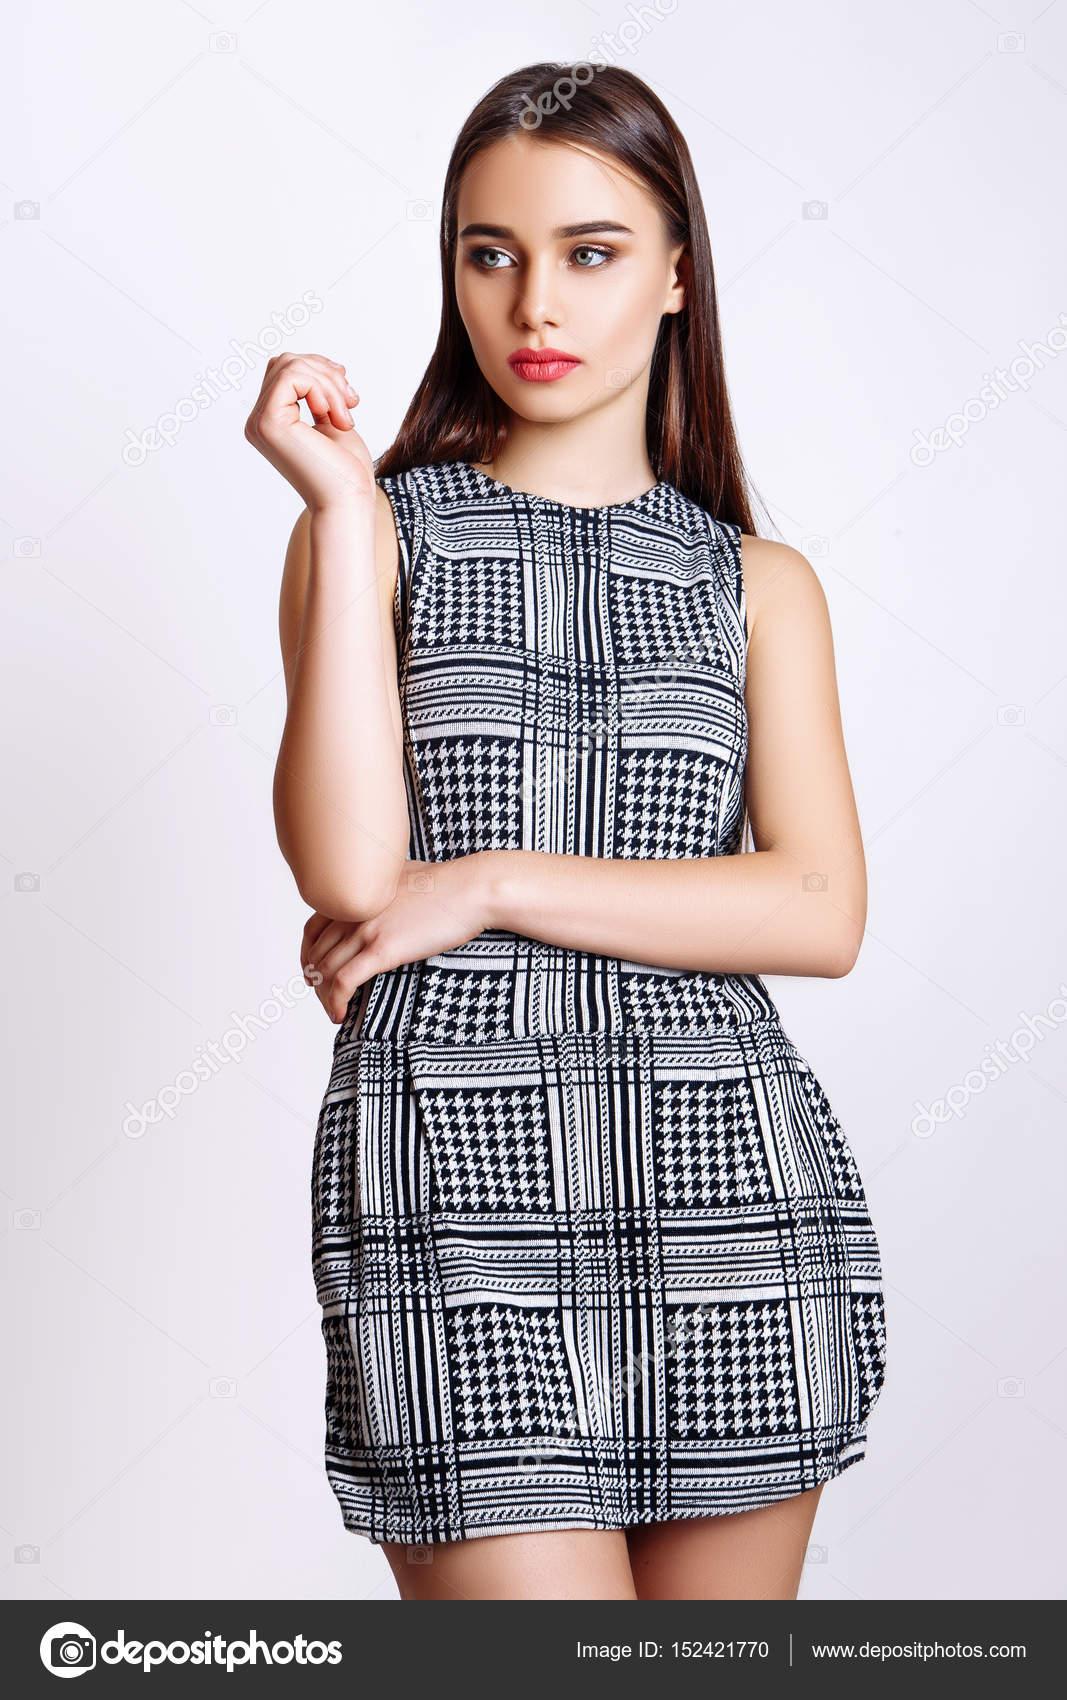 Hermosa mujer glamour modelo ropa ropa de moda 0a33db96c17